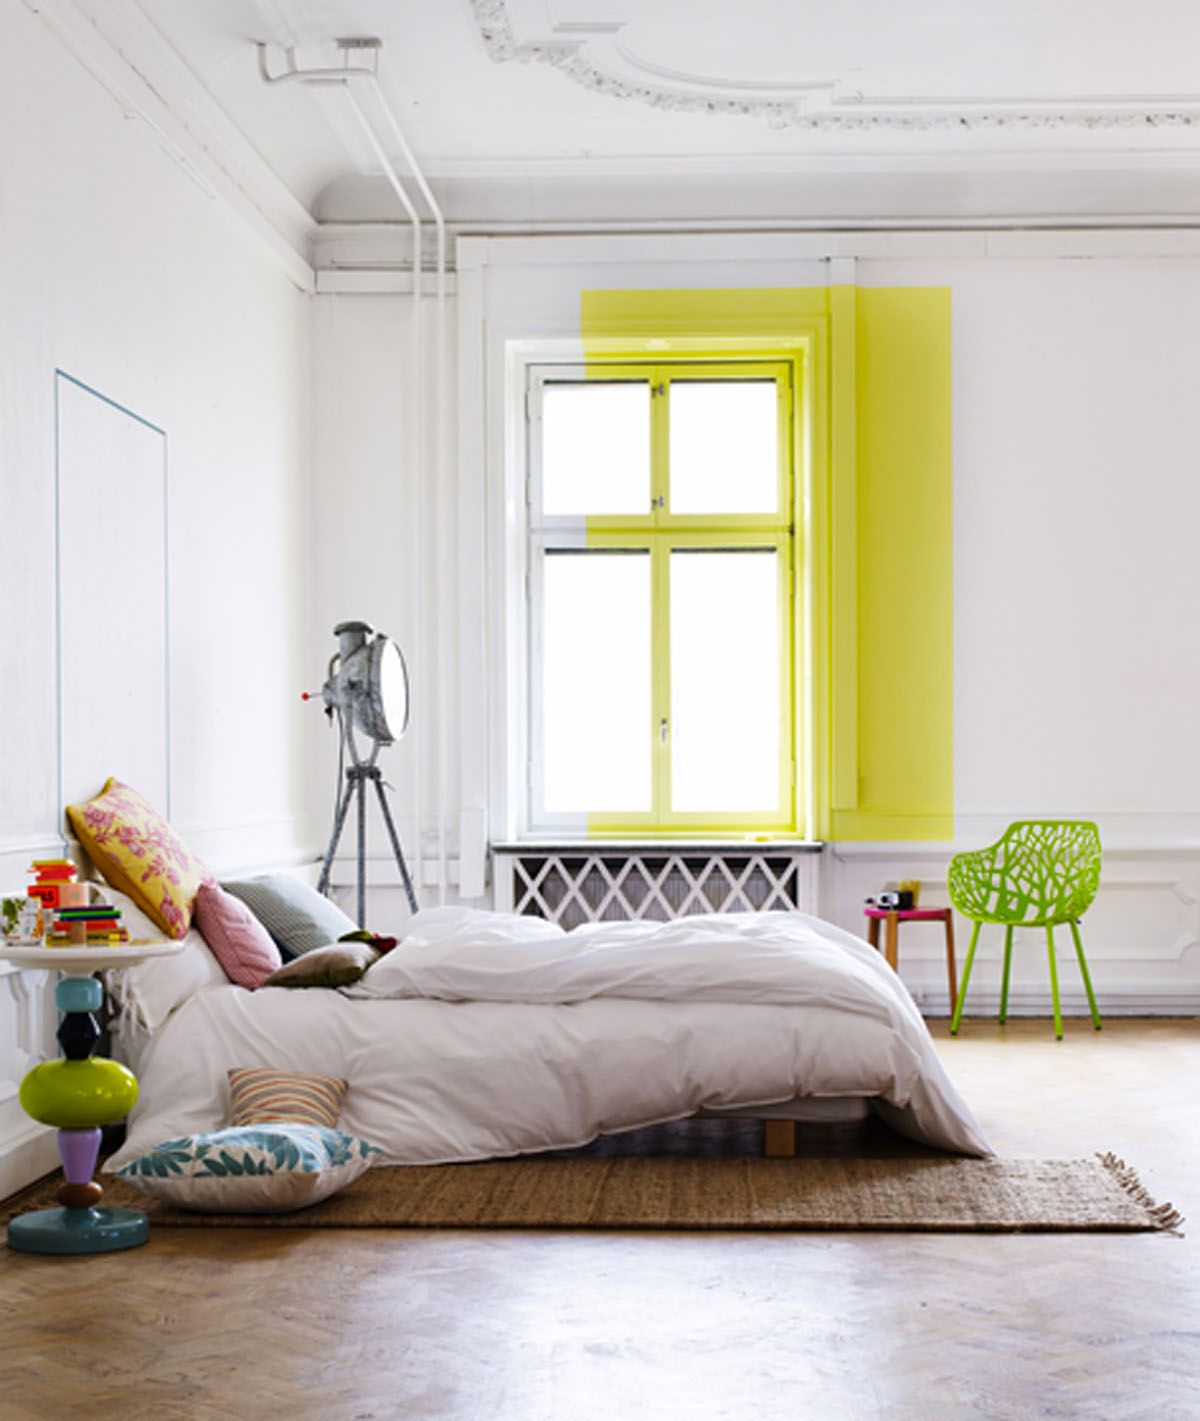 Wandfarbe Gelb: Wandfarbe GELB